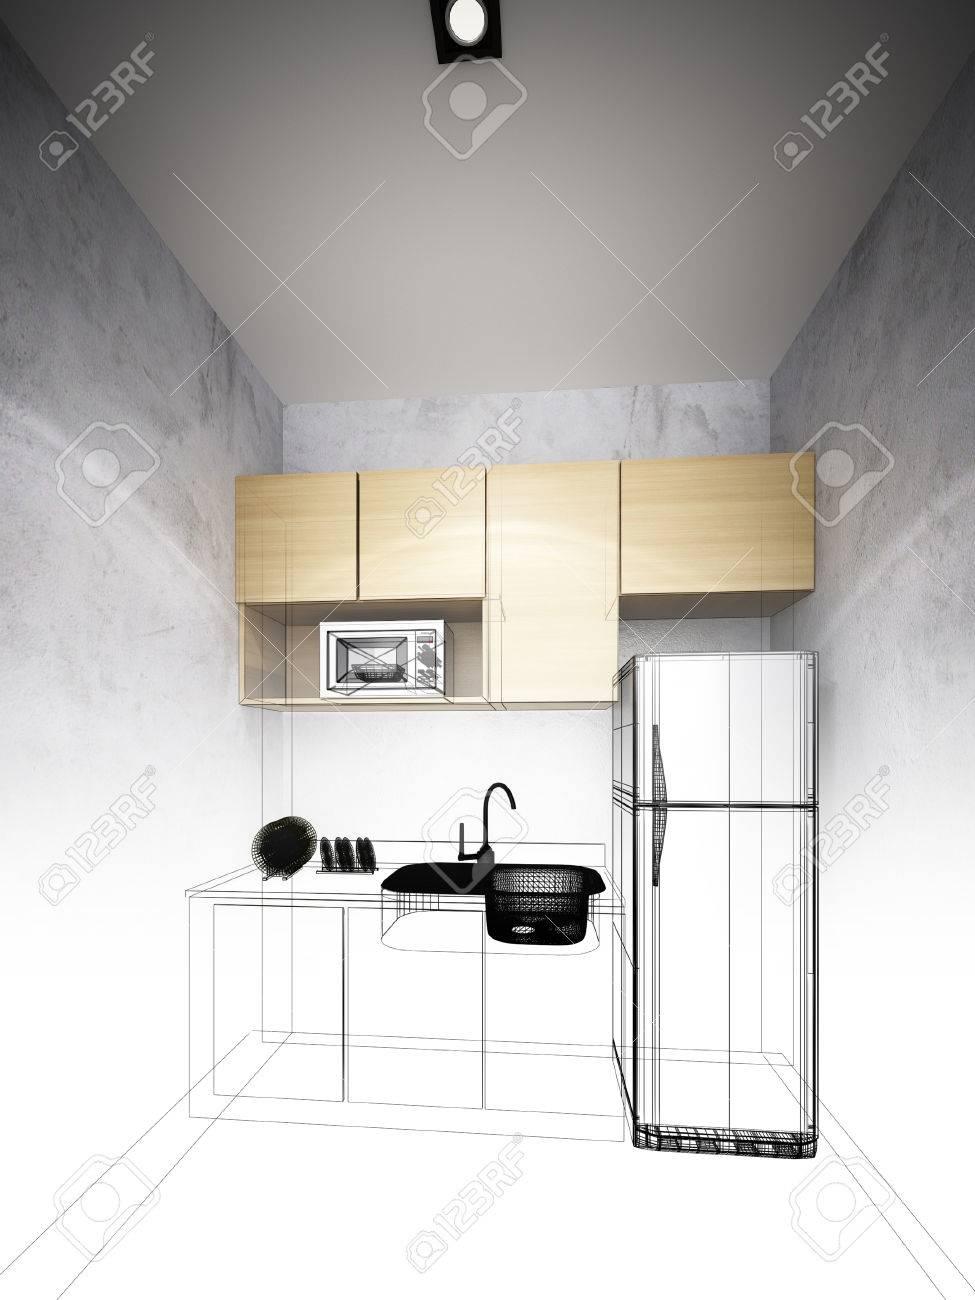 Disegnare La Cucina In 3d. Interesting Cucina D Dal Disegno D With ...